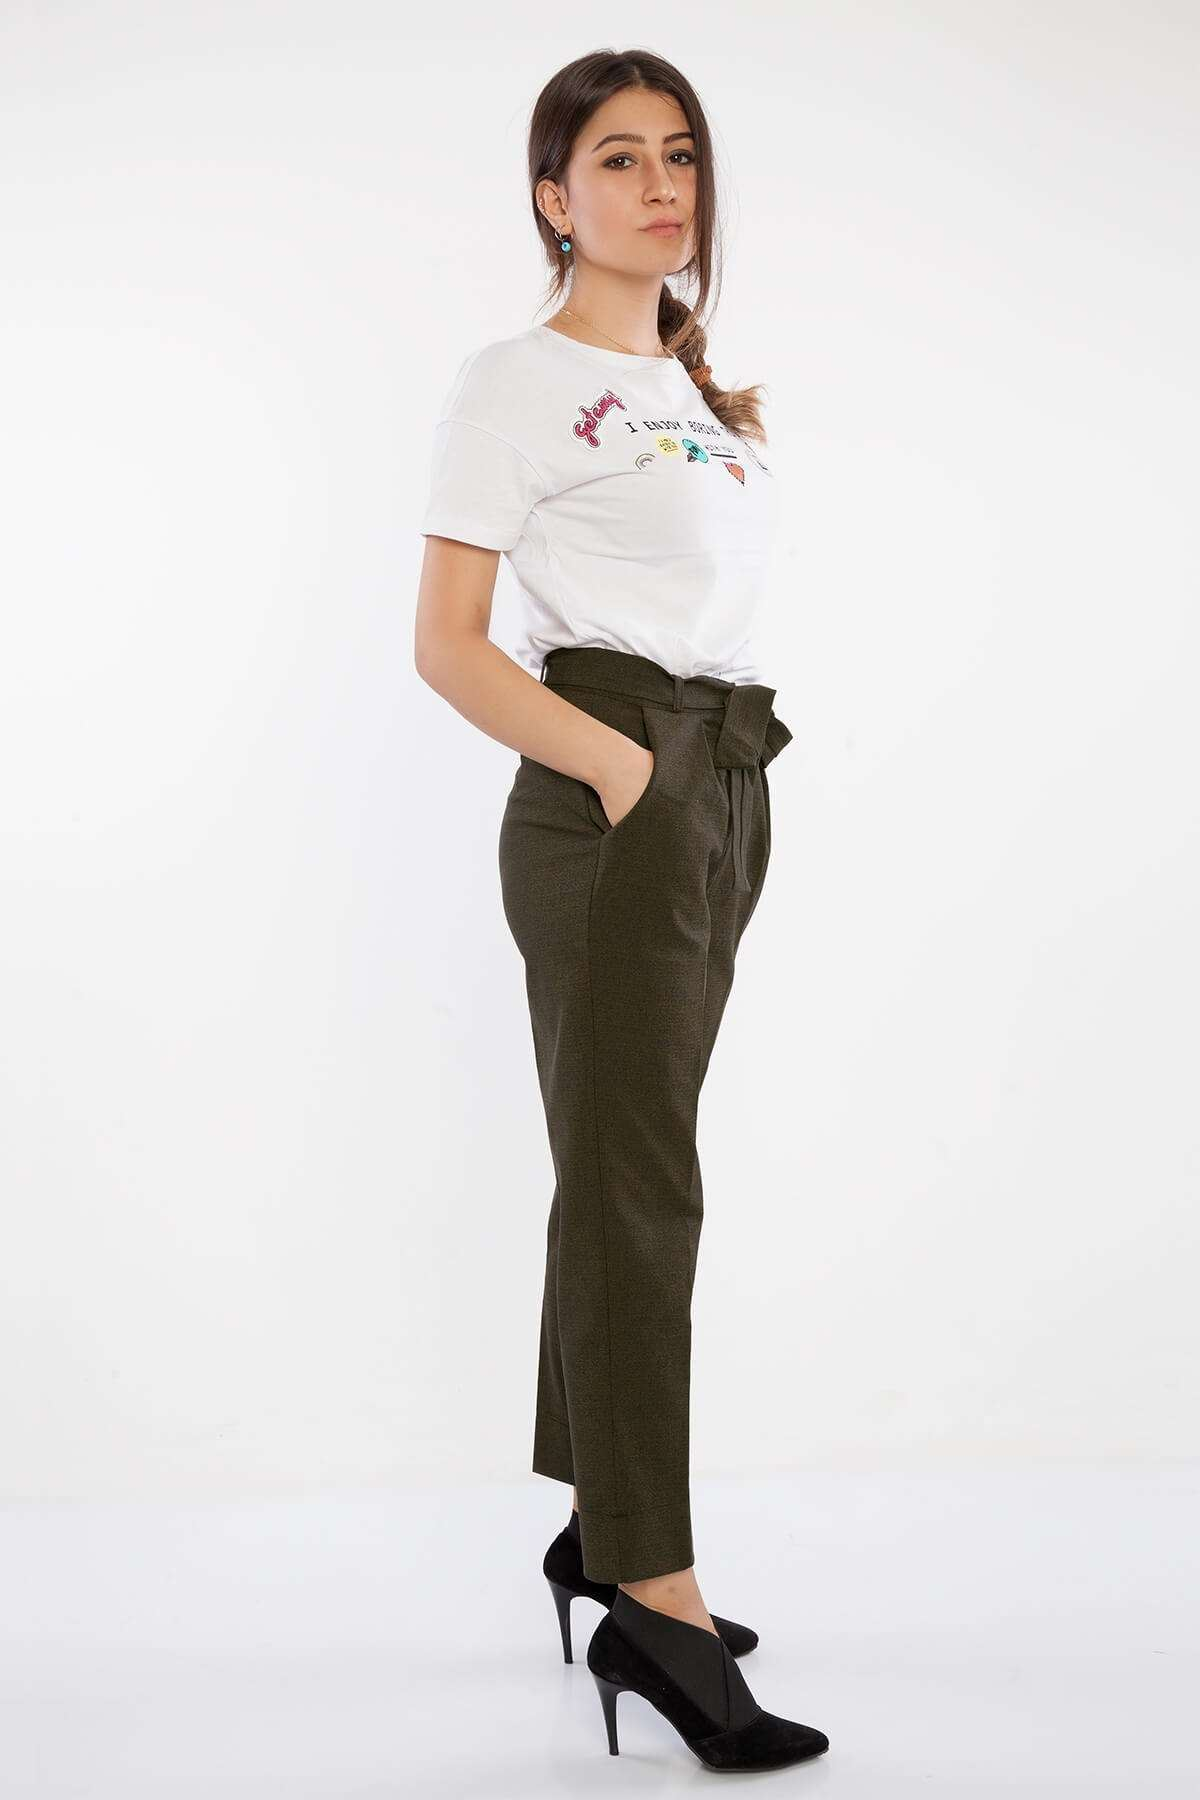 Desenli Kemer Detaylı Havuç Pantolon Haki-Laci